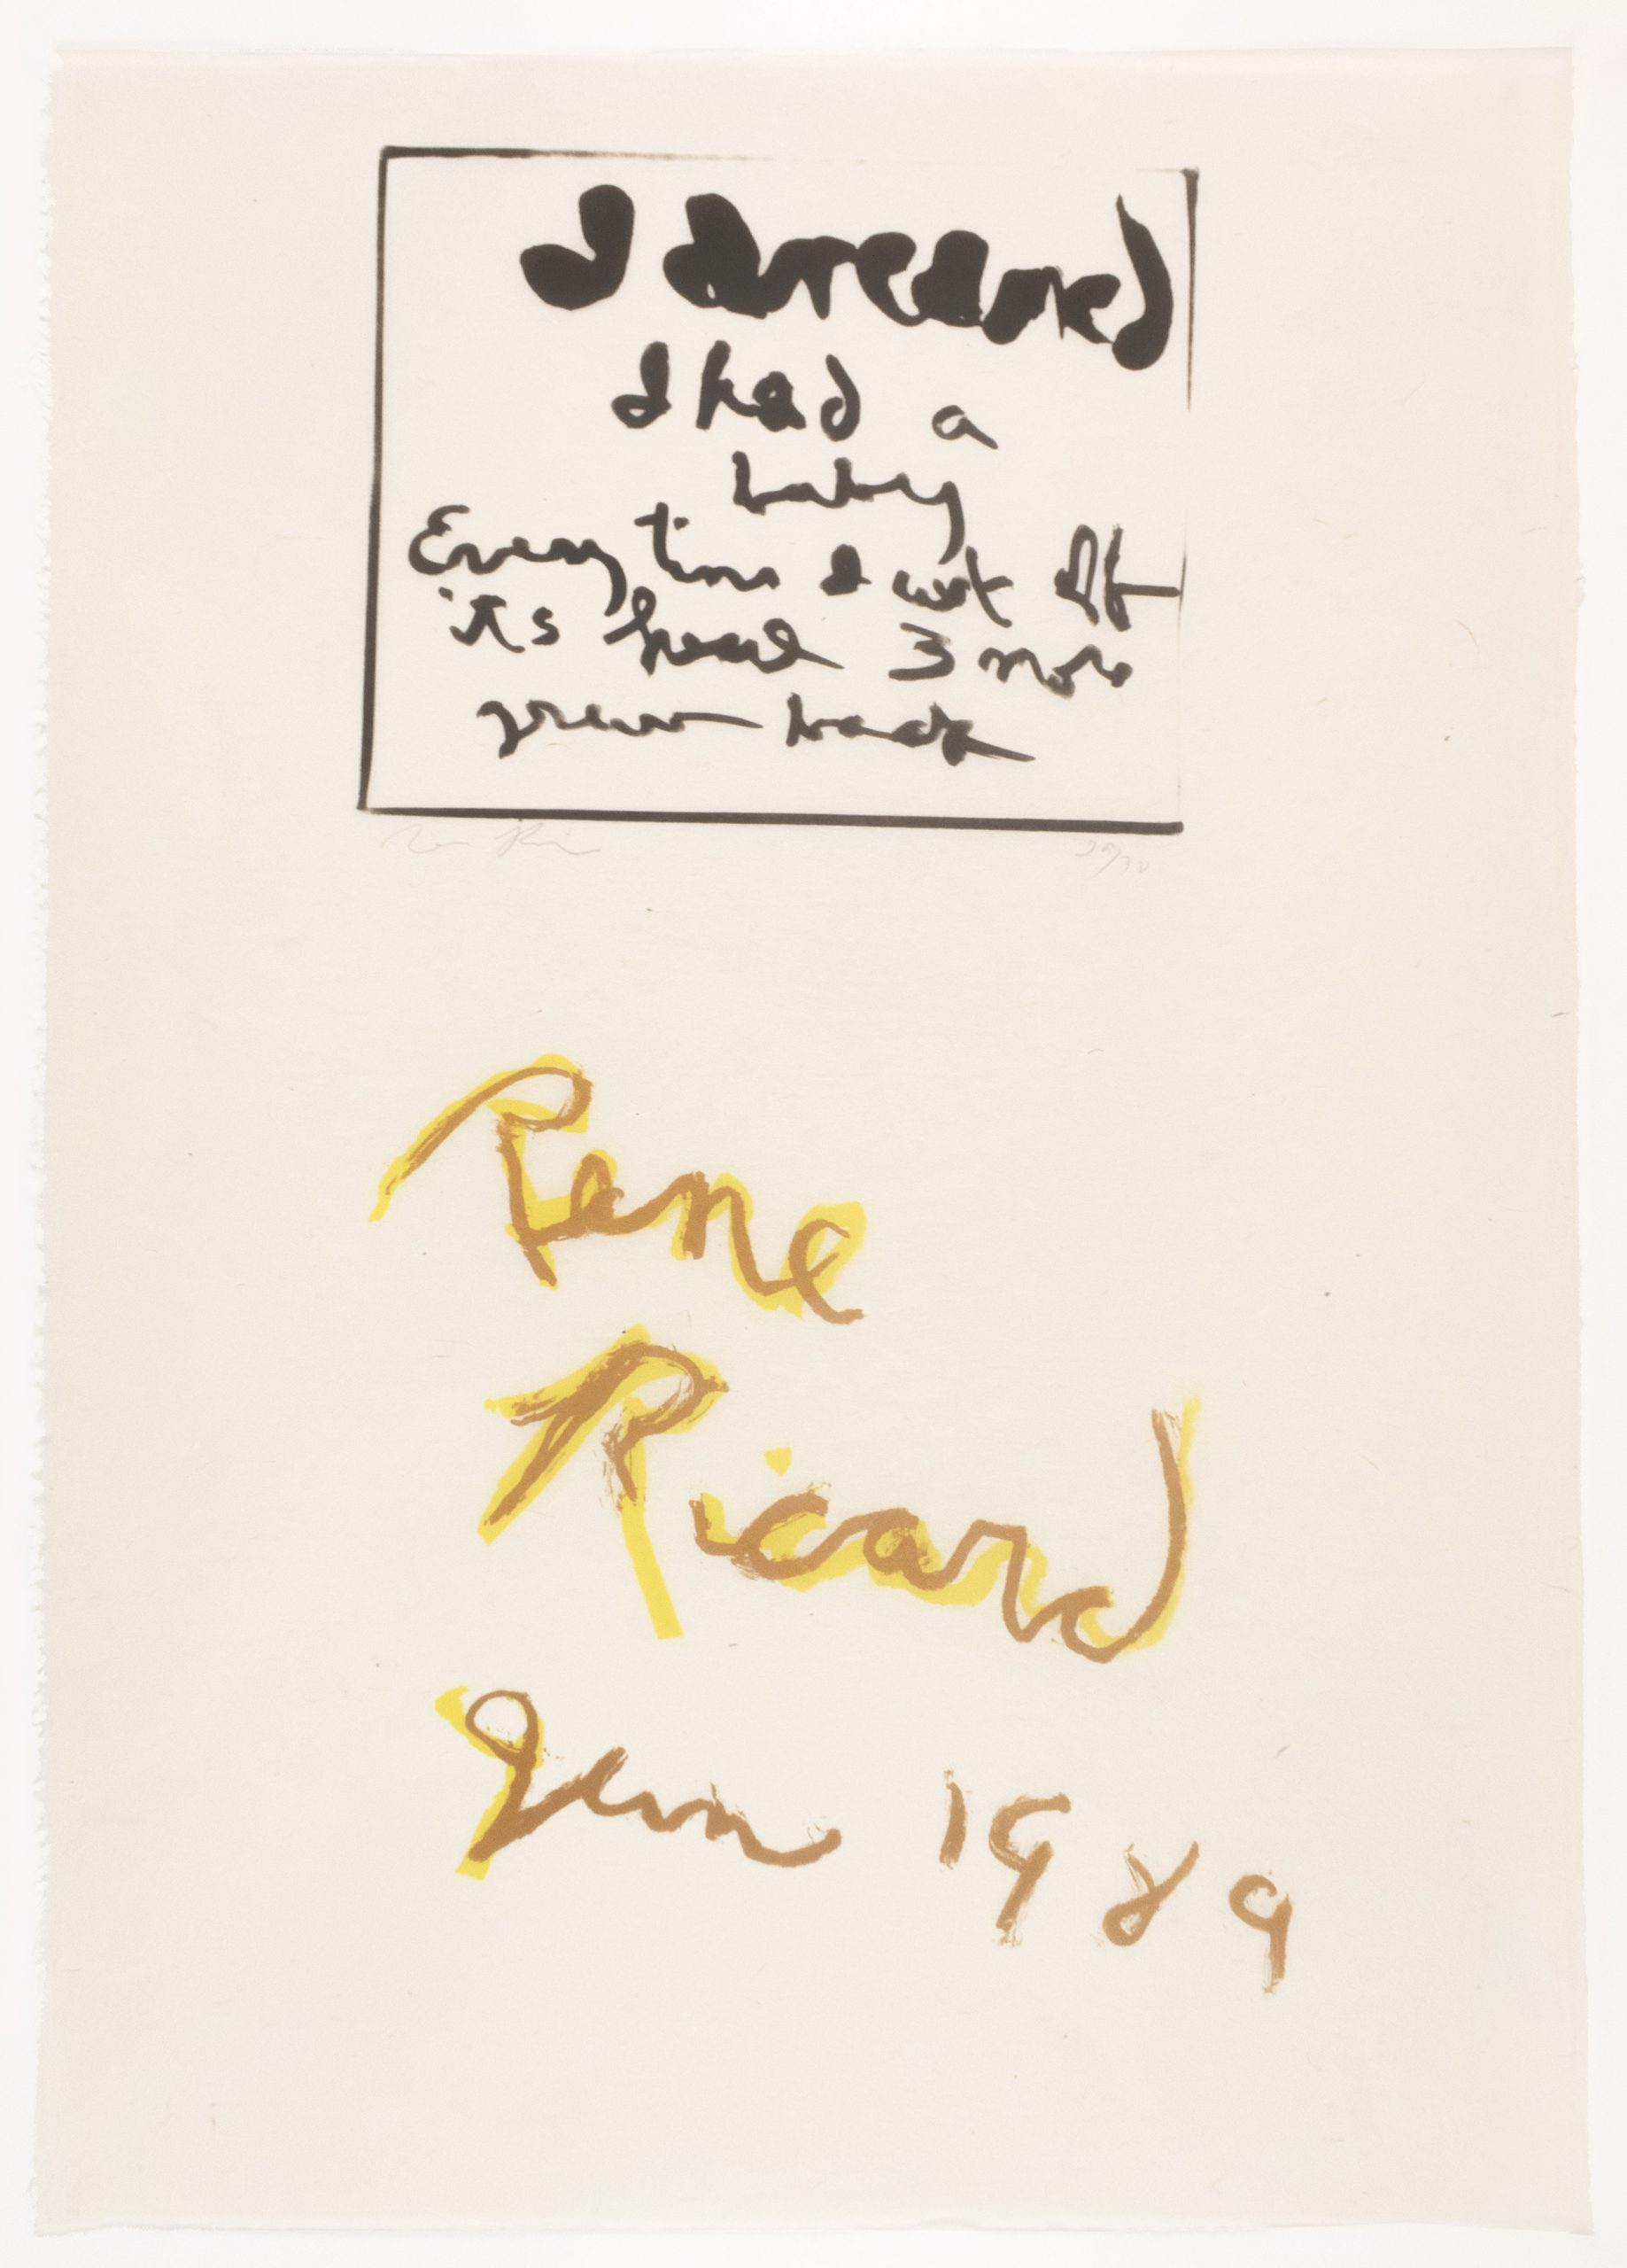 I Dreamed by Rene Ricard